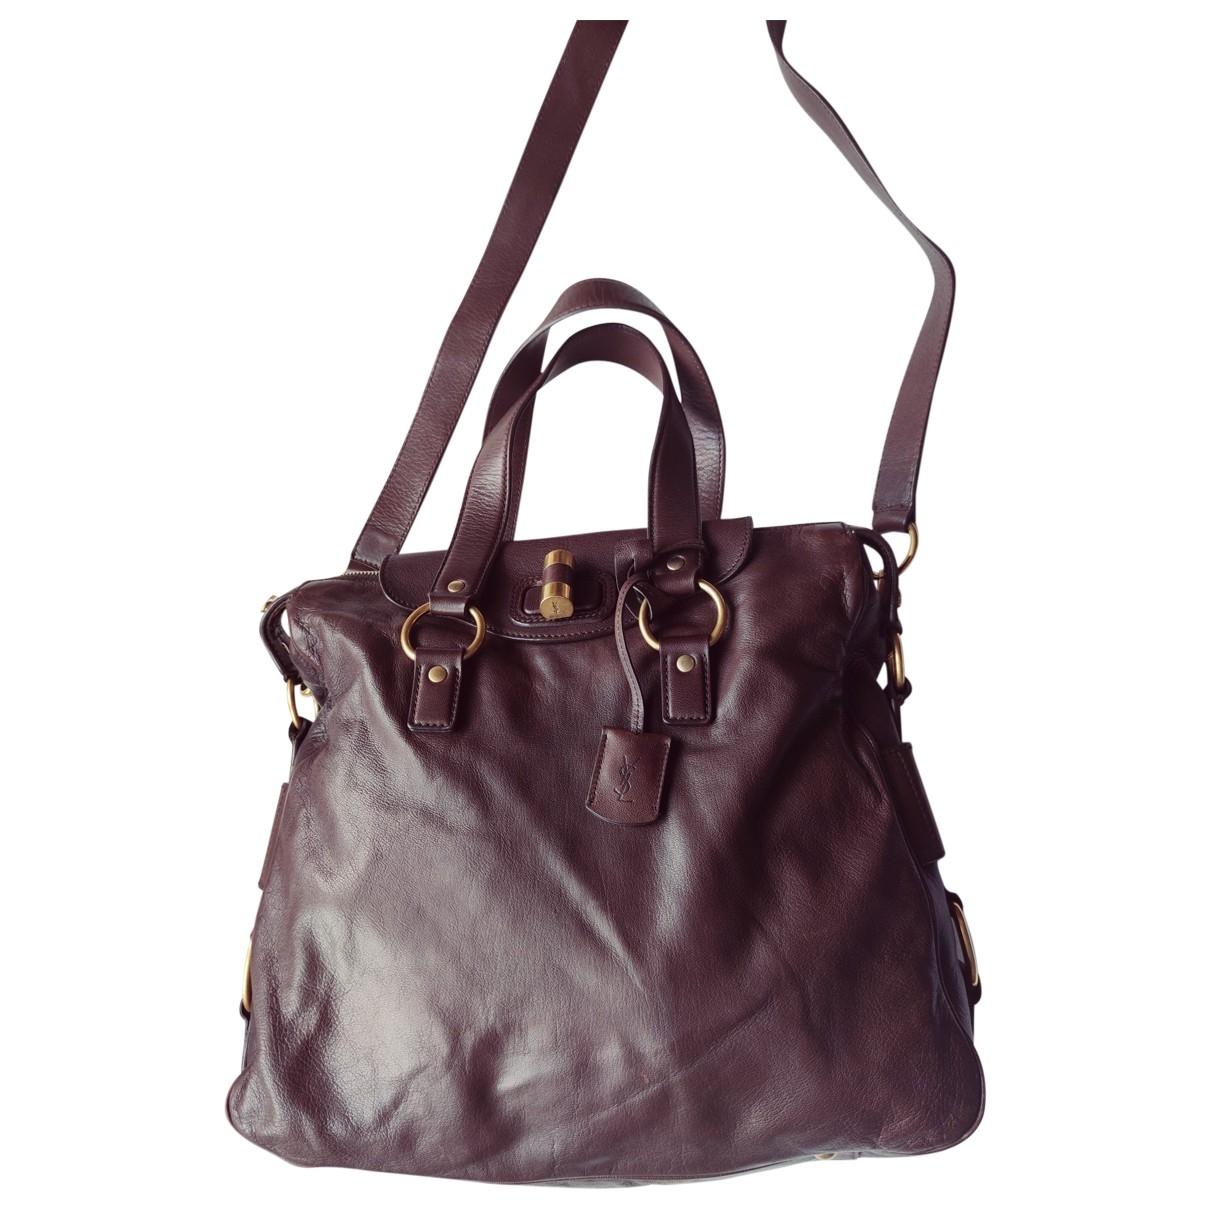 Yves Saint Laurent Muse Brown Leather handbag for Women \N